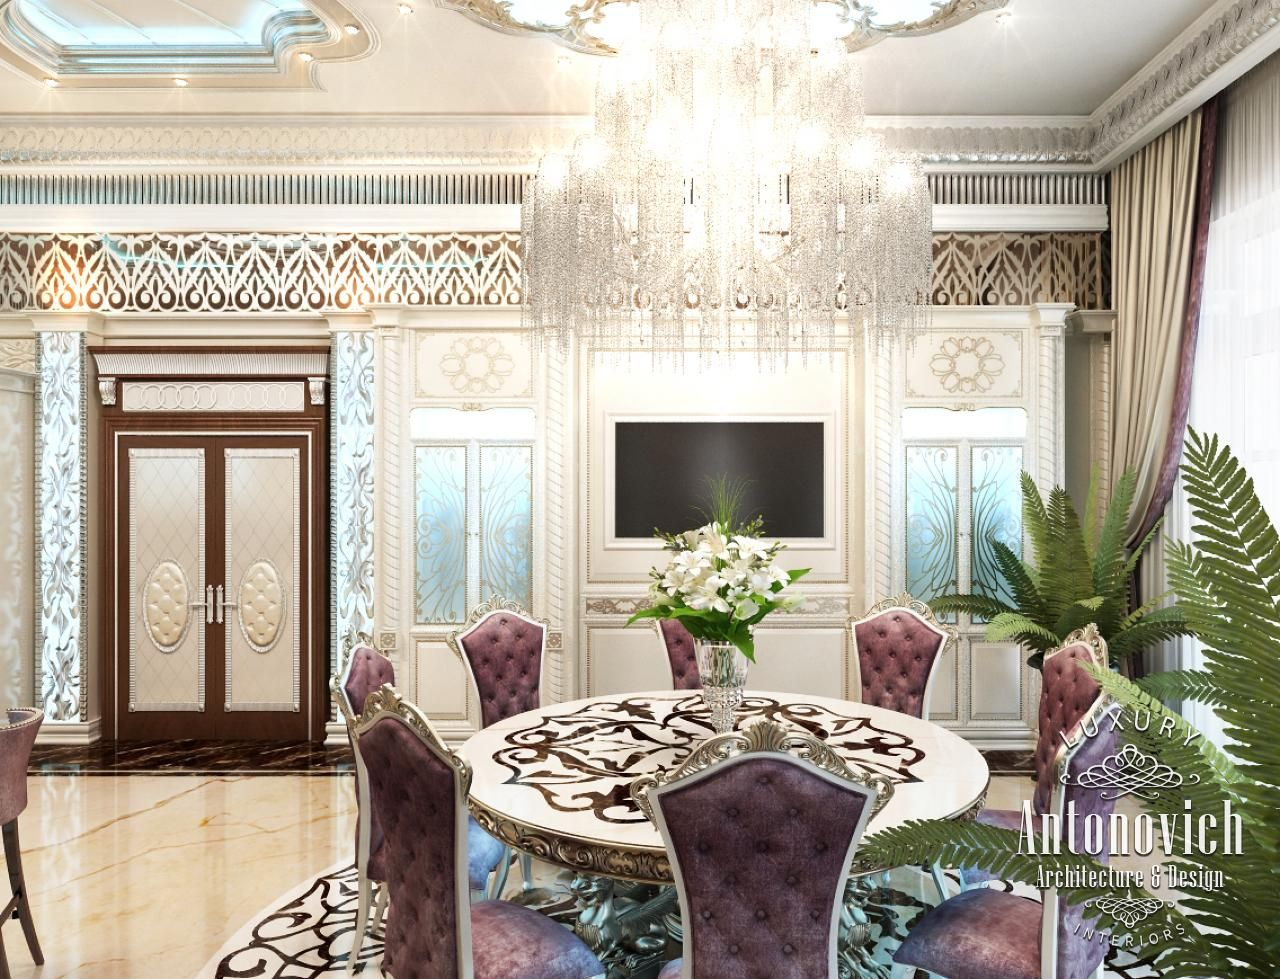 Kitchens dubai from antonovich design - Kitchen Design In Dubai Luxury Kitchen Abu Dhabi Photo 6